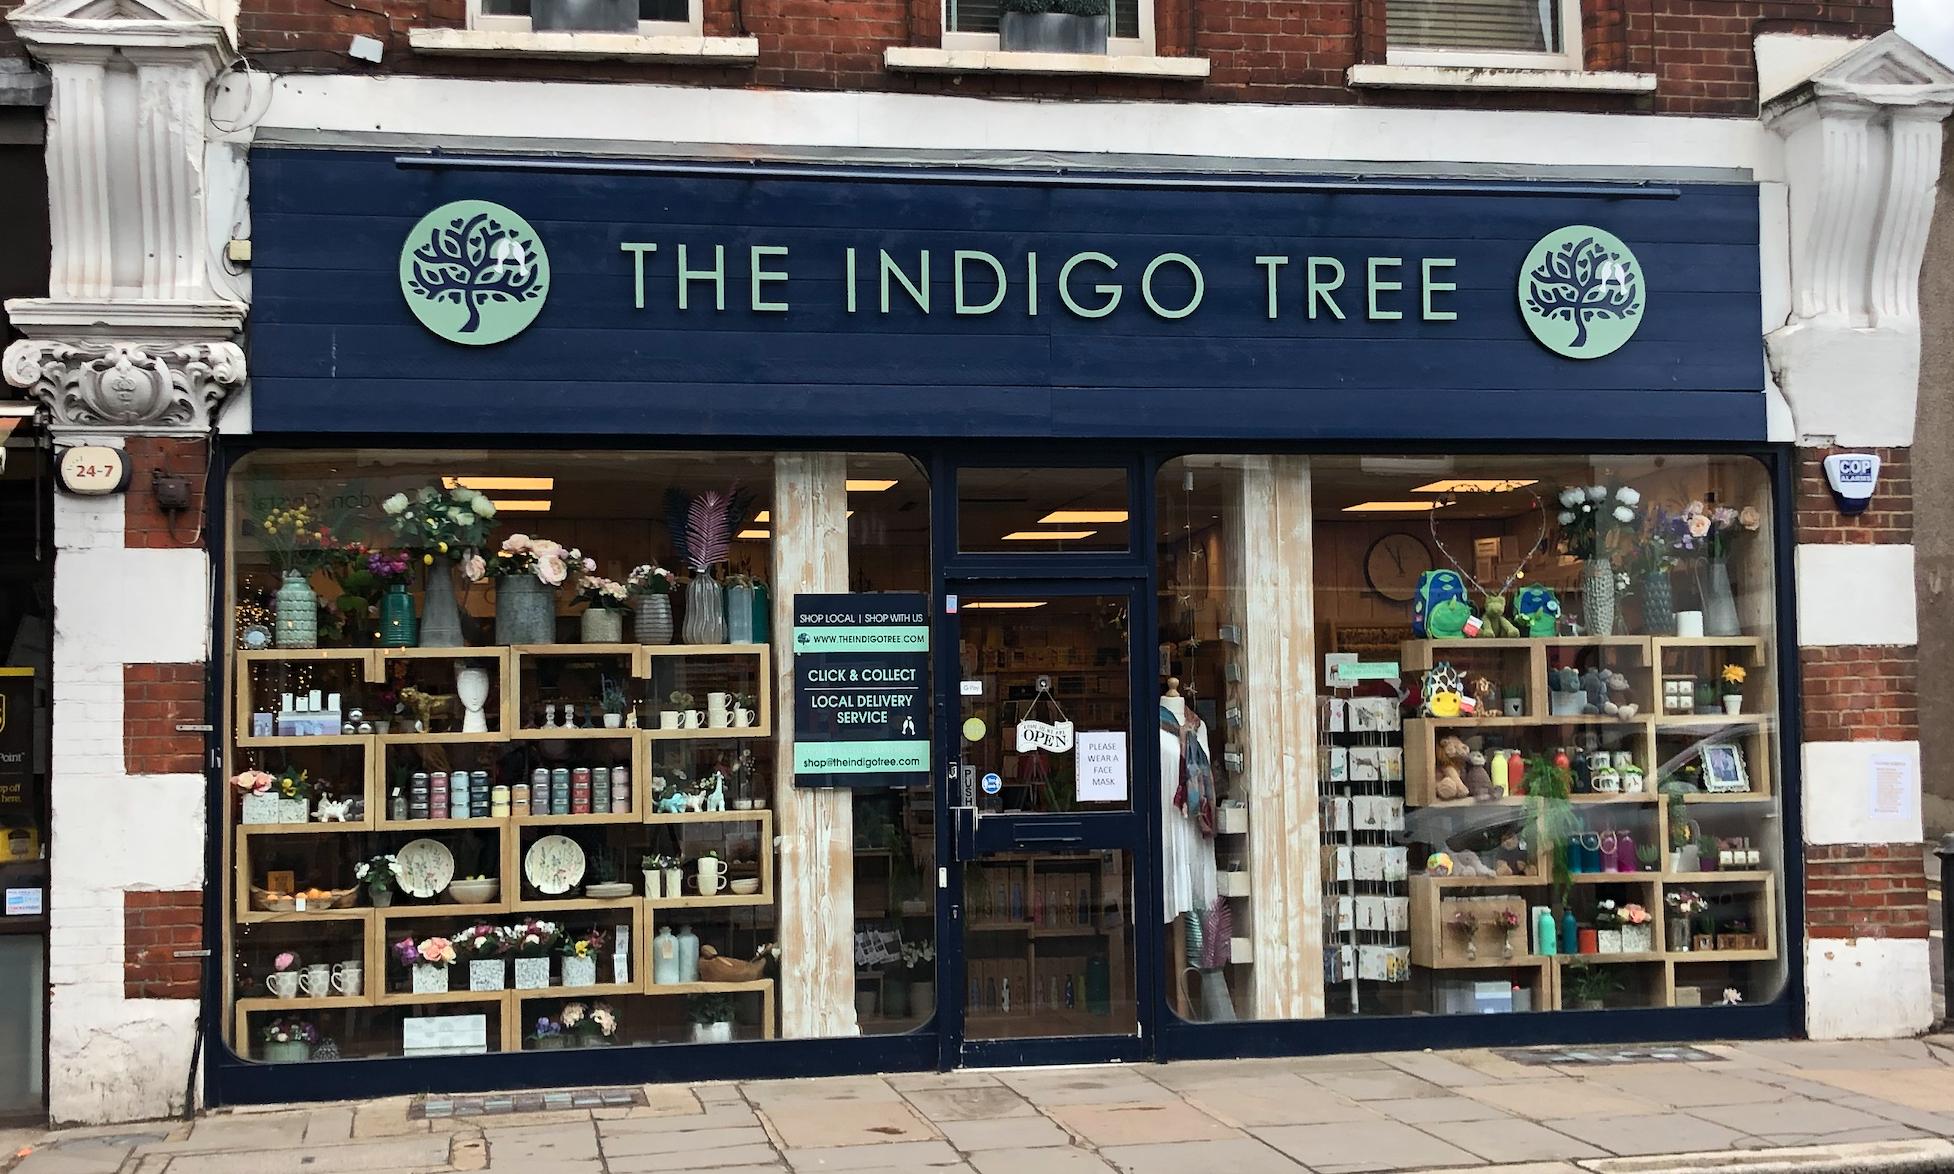 Above: The Indigo Tree's Crystal Palace shop.